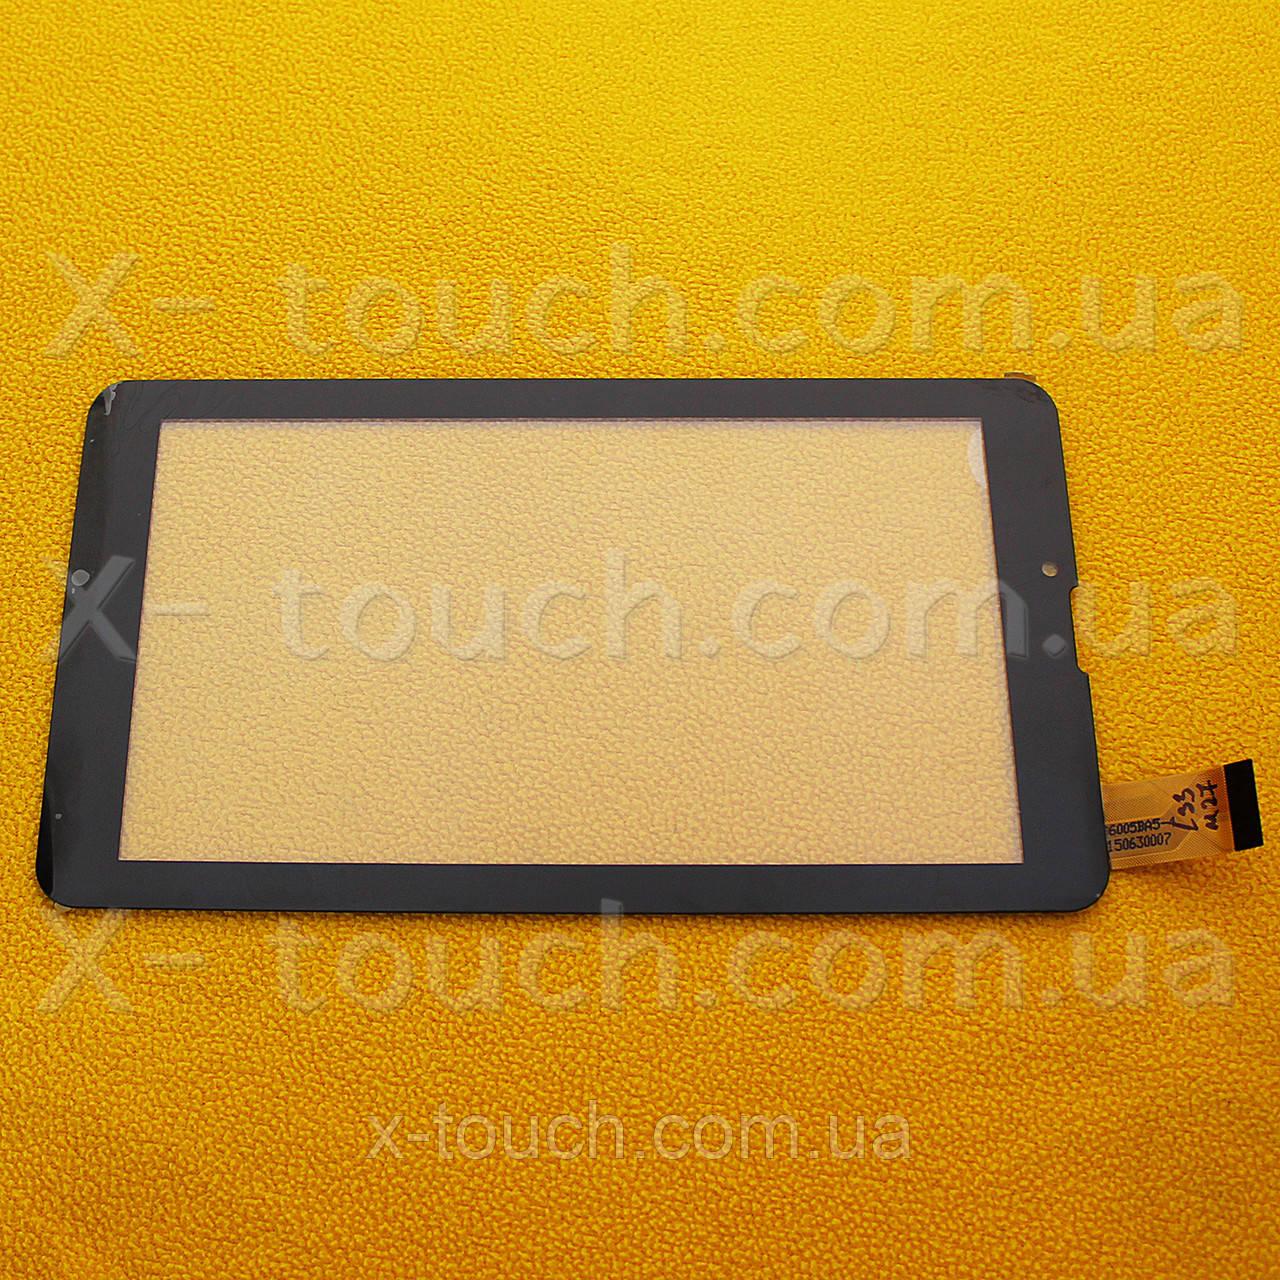 ZCC-2492 V1 FPC cенсор, тачскрин для планшета 7,0 дюймов